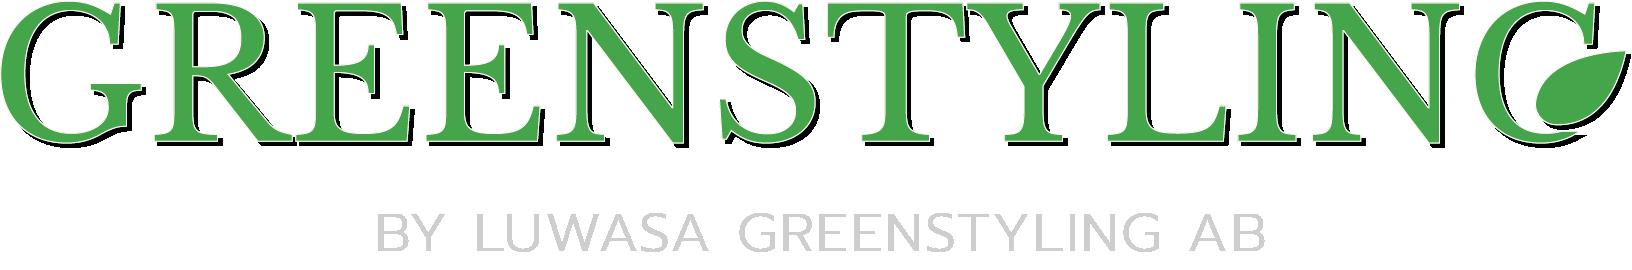 Luwasa Greenstyling online